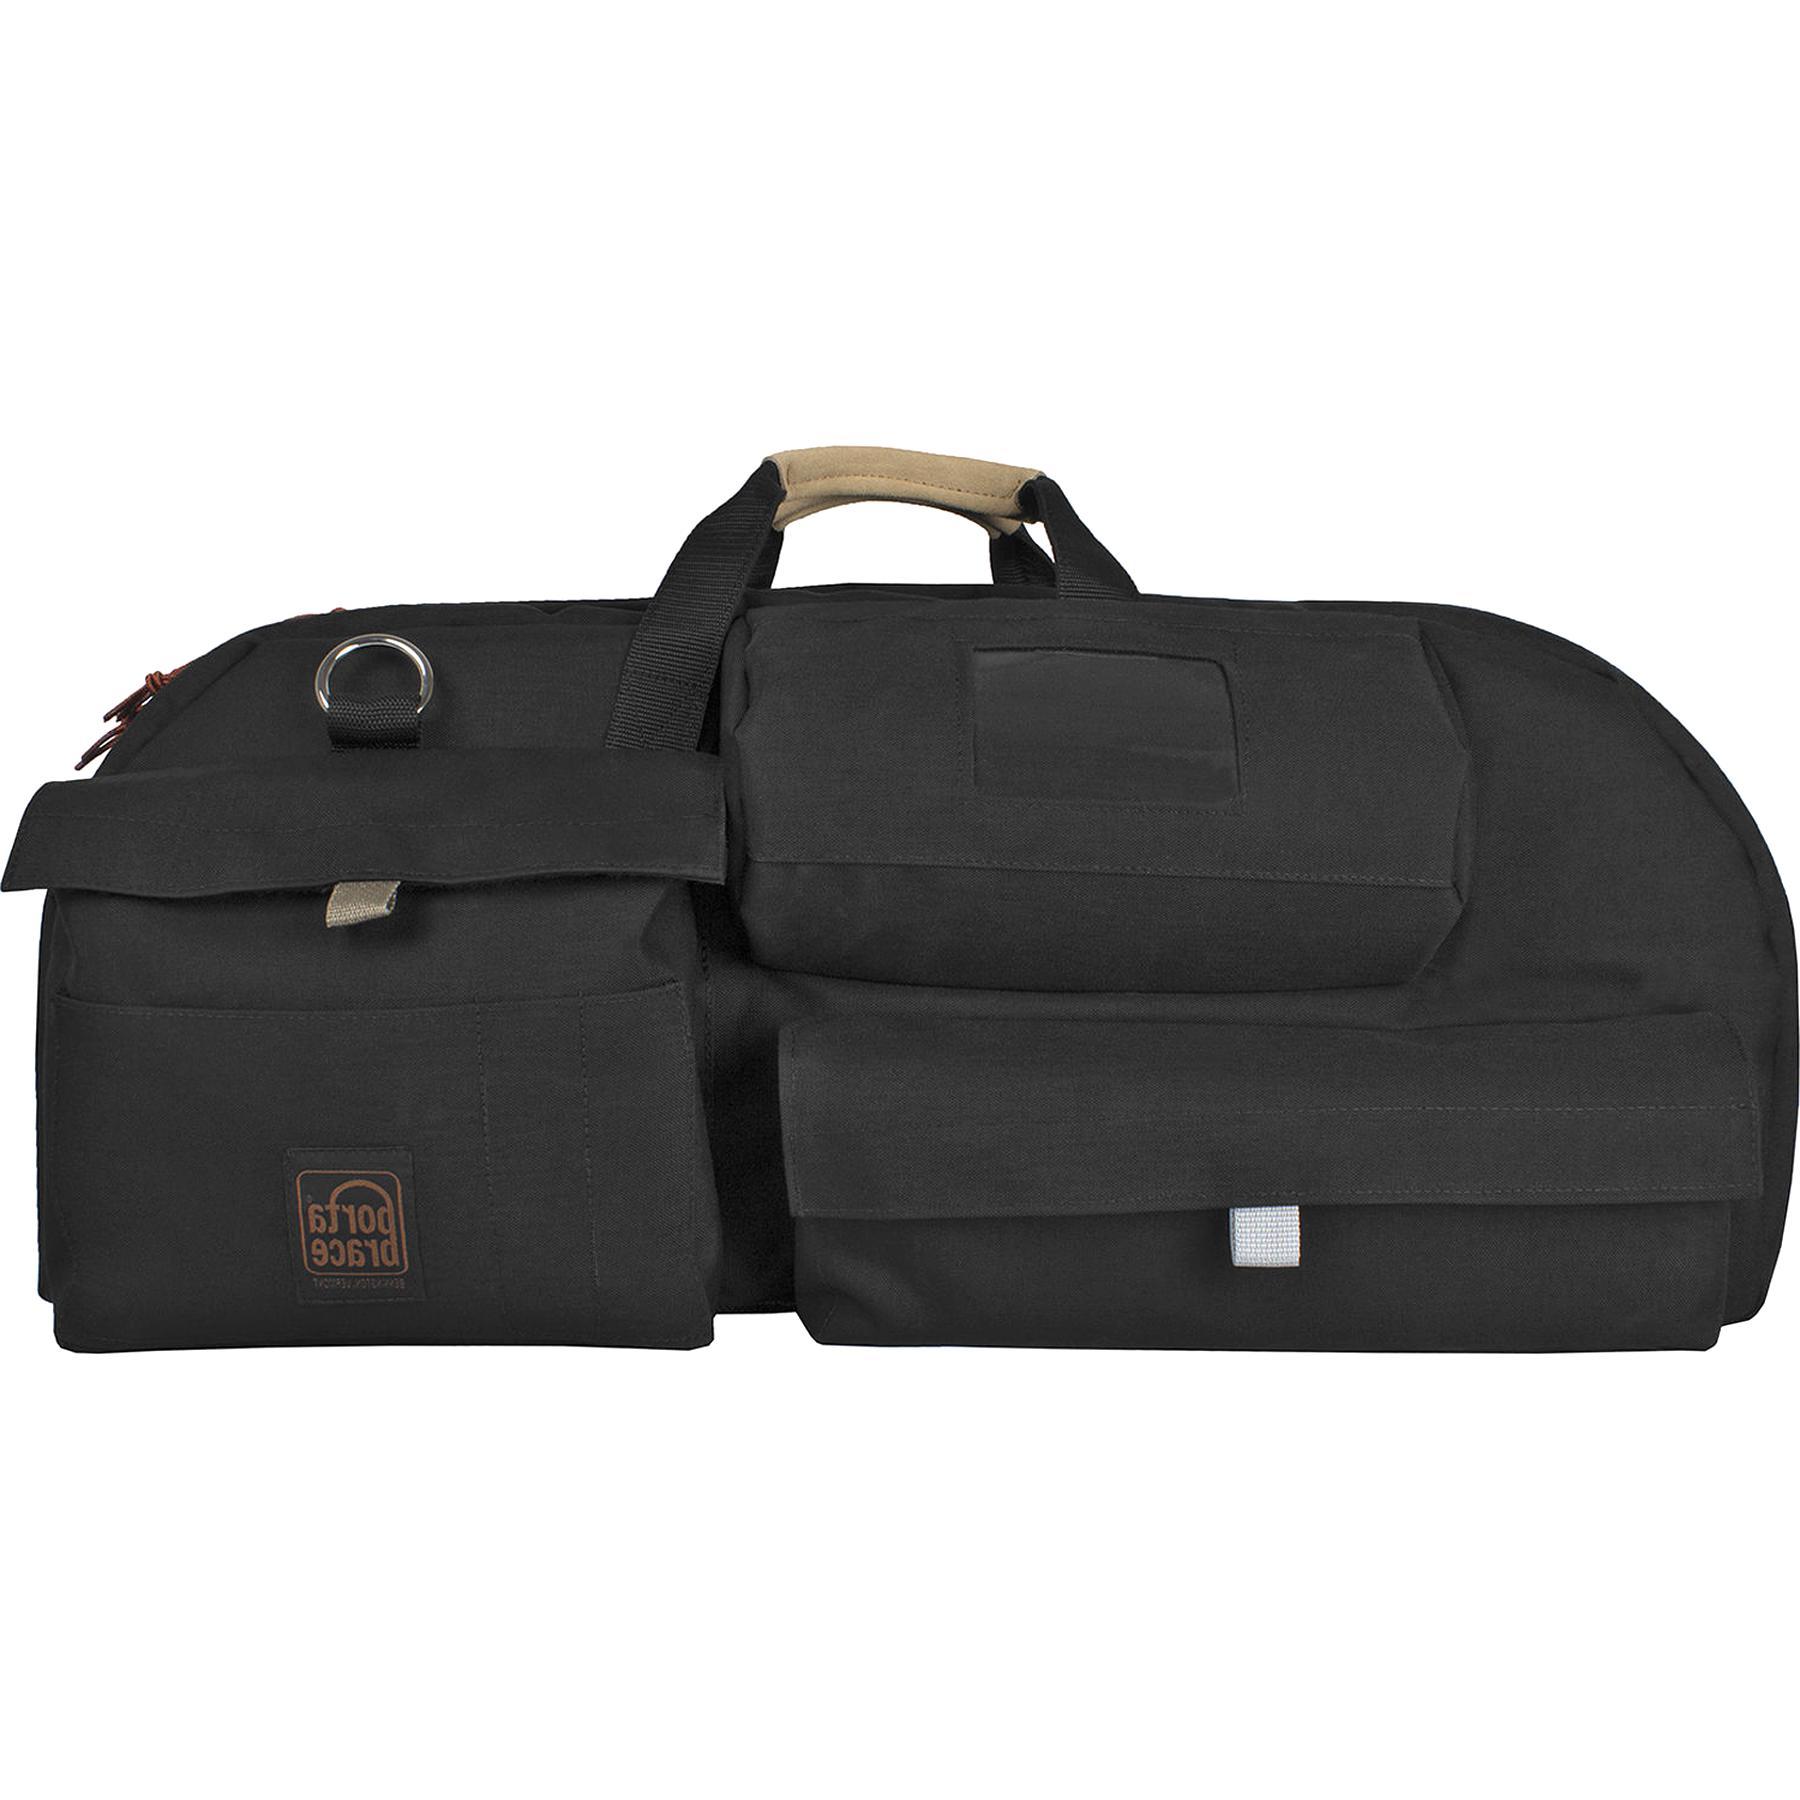 camcorder case porta brace for sale